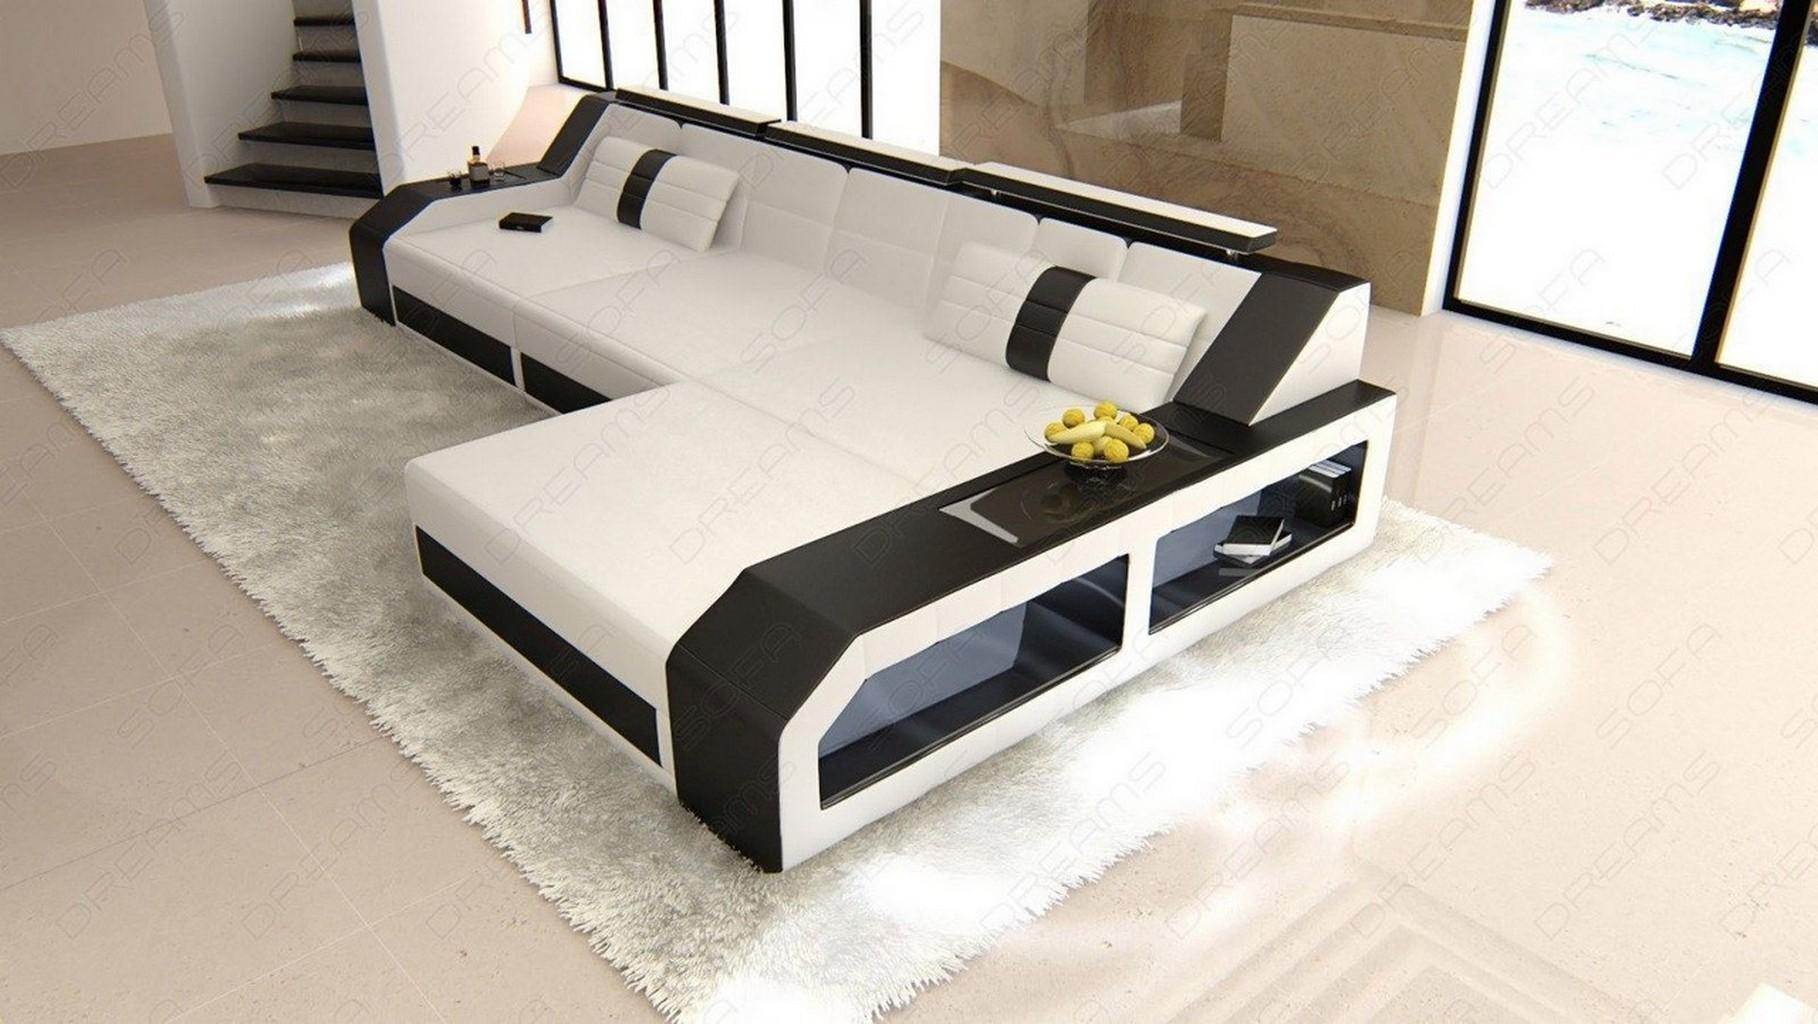 ledersofa arezzo l form eckcouch mit beleuchtung weiss schwarz ebay. Black Bedroom Furniture Sets. Home Design Ideas